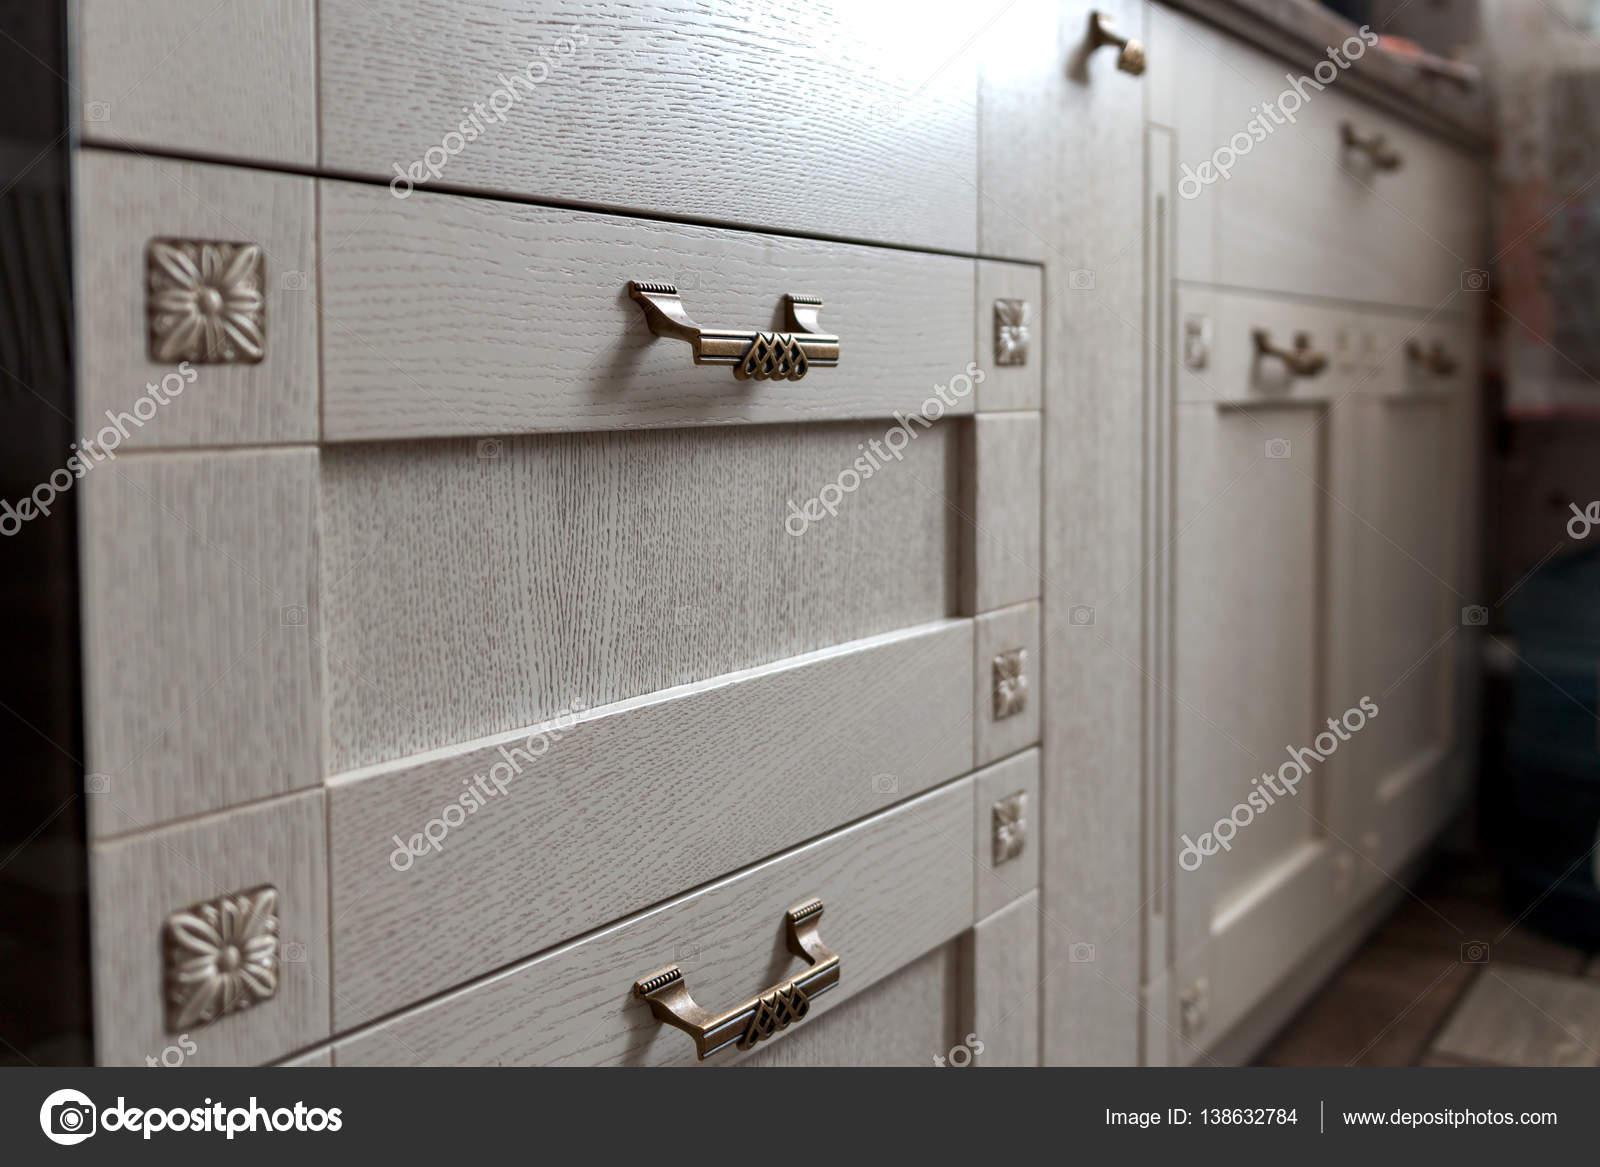 Metalen Kast Retro : Retro metalen kast knoppen in de keuken u stockfoto evpv